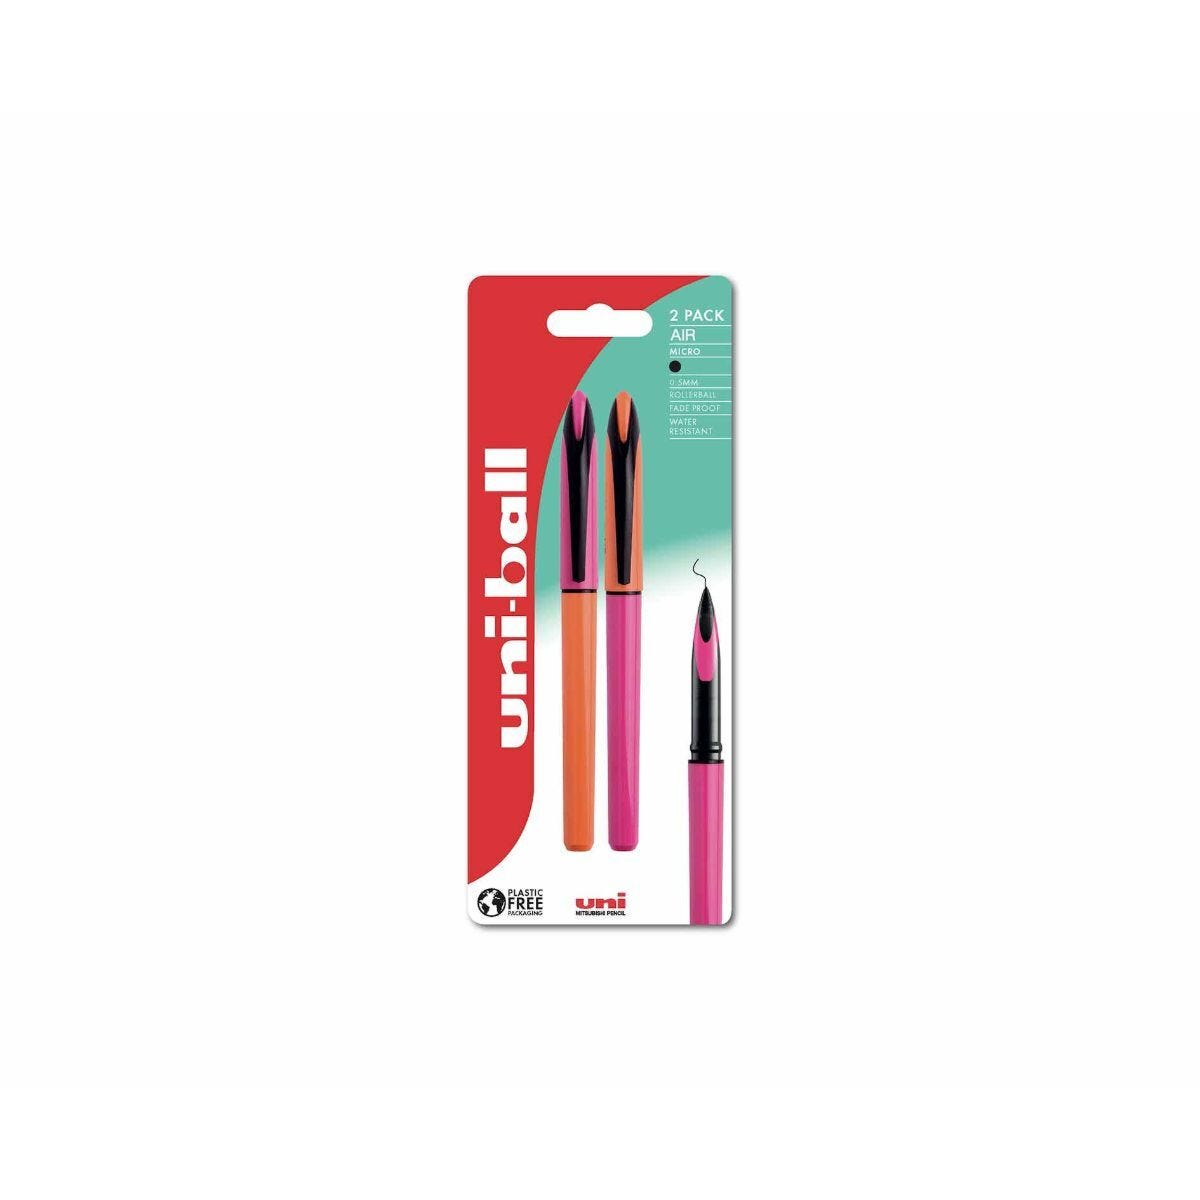 uni-ball Air Handwriting Pen Plastic Free Packaging Pack of 2 Orange/Pink